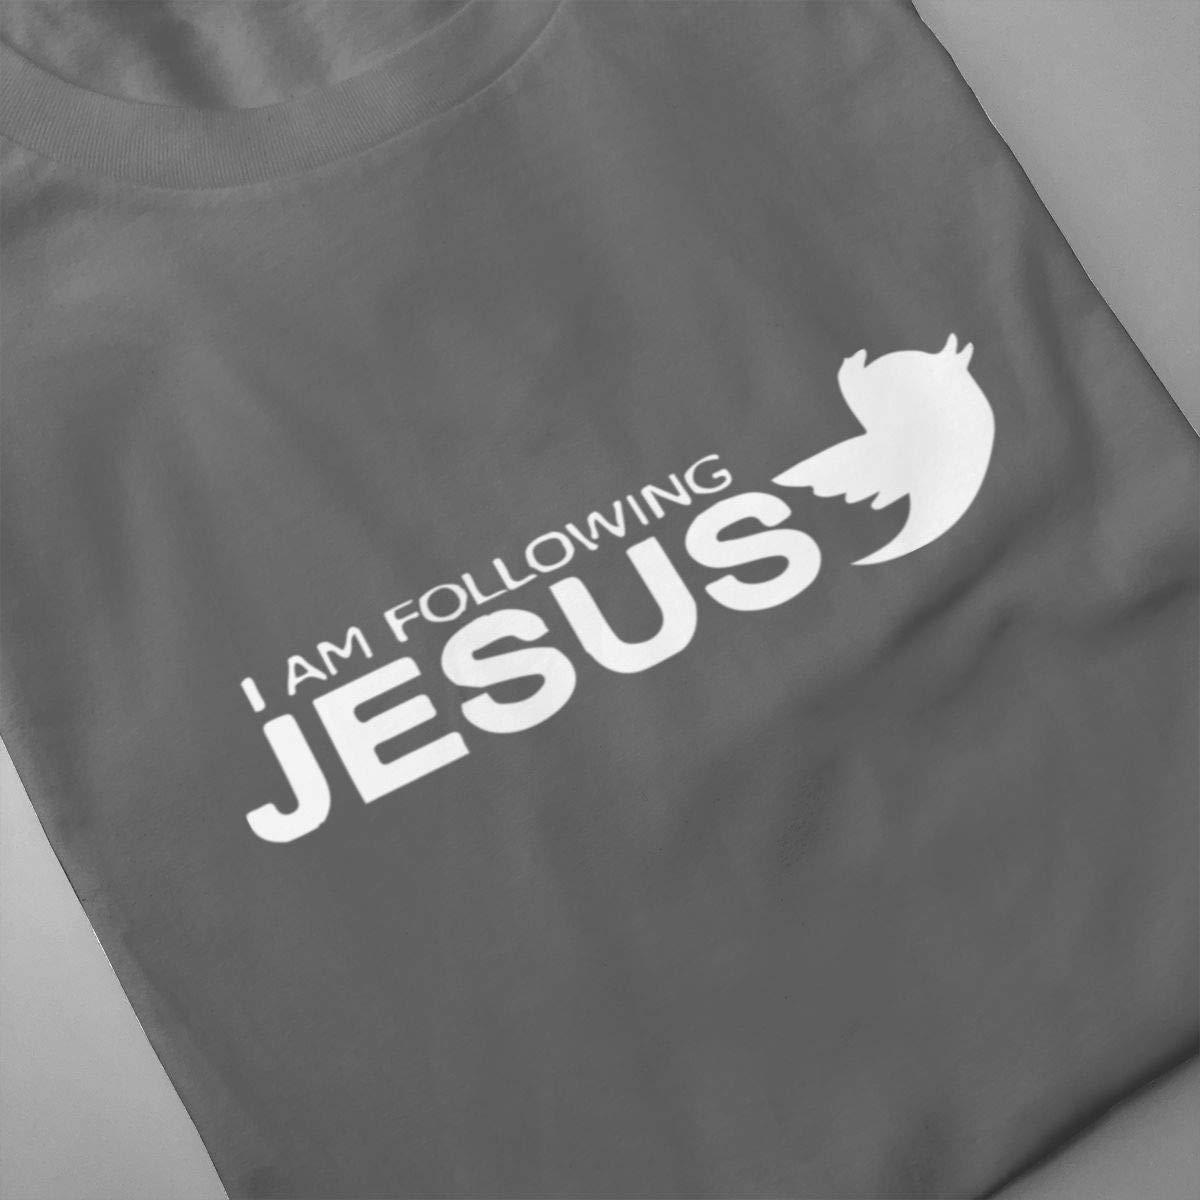 VIIHAHN Men Design I Am Following Jesus Gym Round Neck Short Sleeve T Shirts